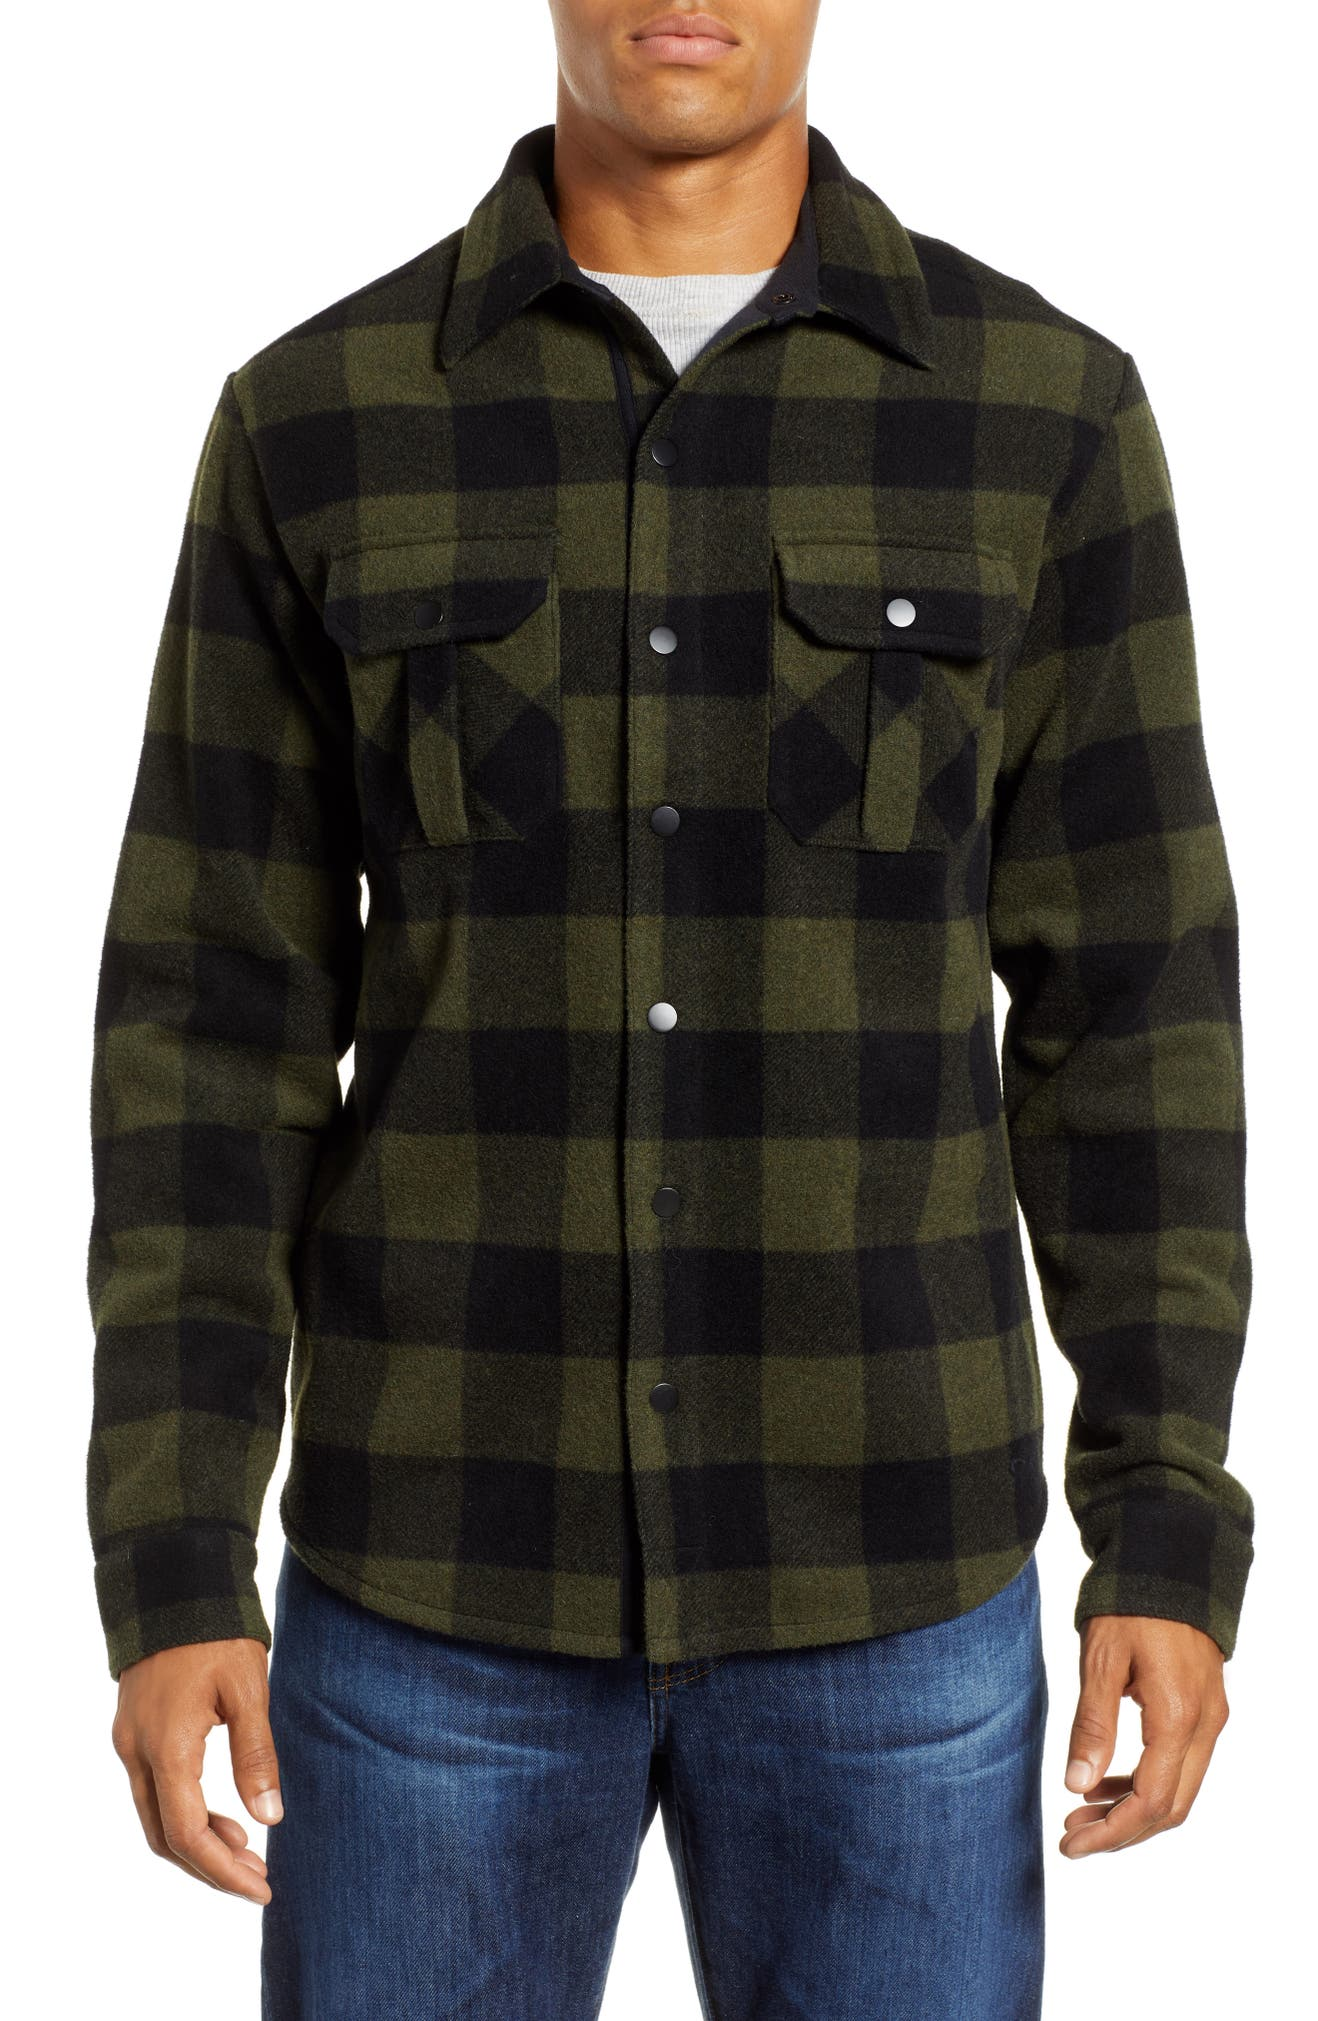 b35119a16221 Smartwool Anchor Line Flannel Shirt Jacket | Nordstrom